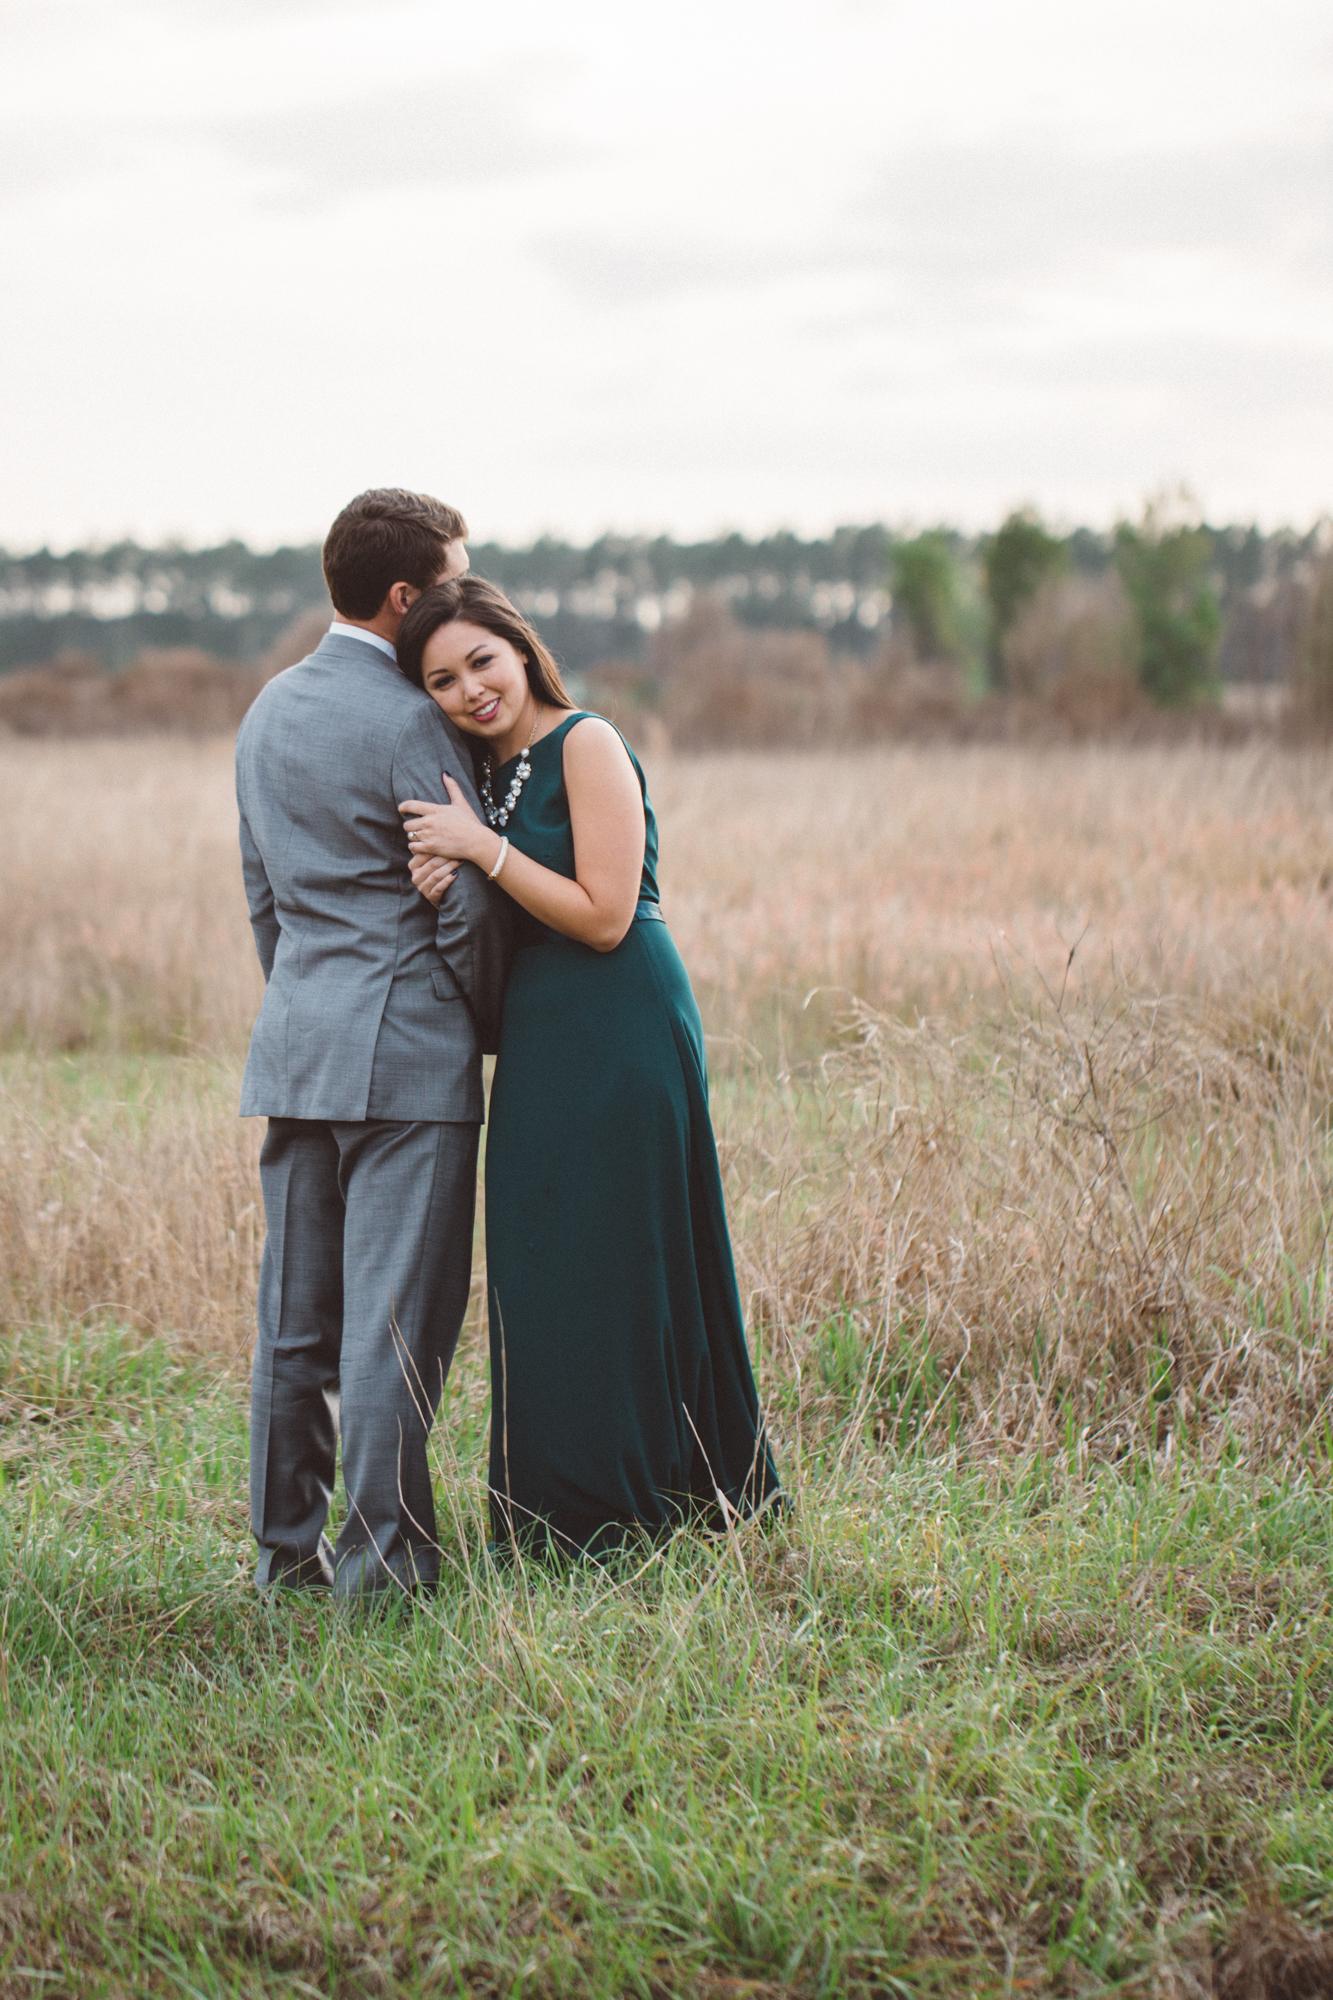 Orlando Engagement Photographer-36.jpg